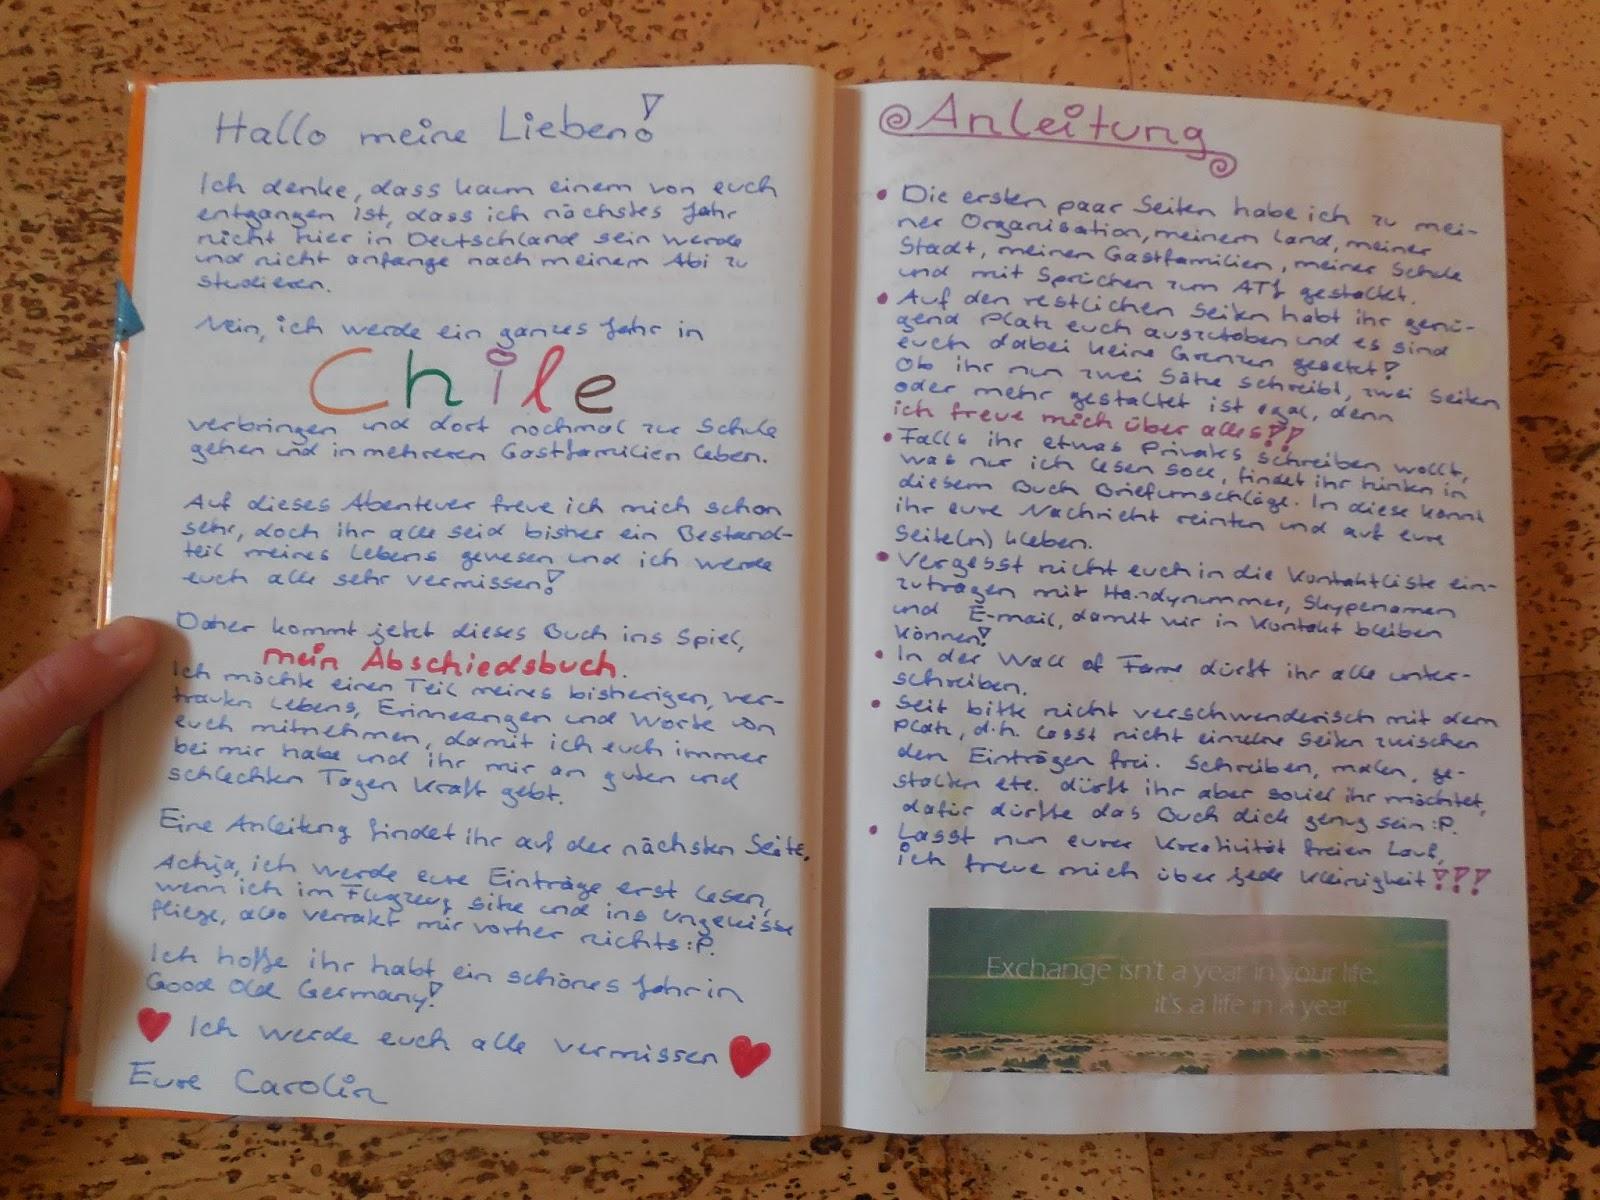 caro's gap year in chile!: november 2015